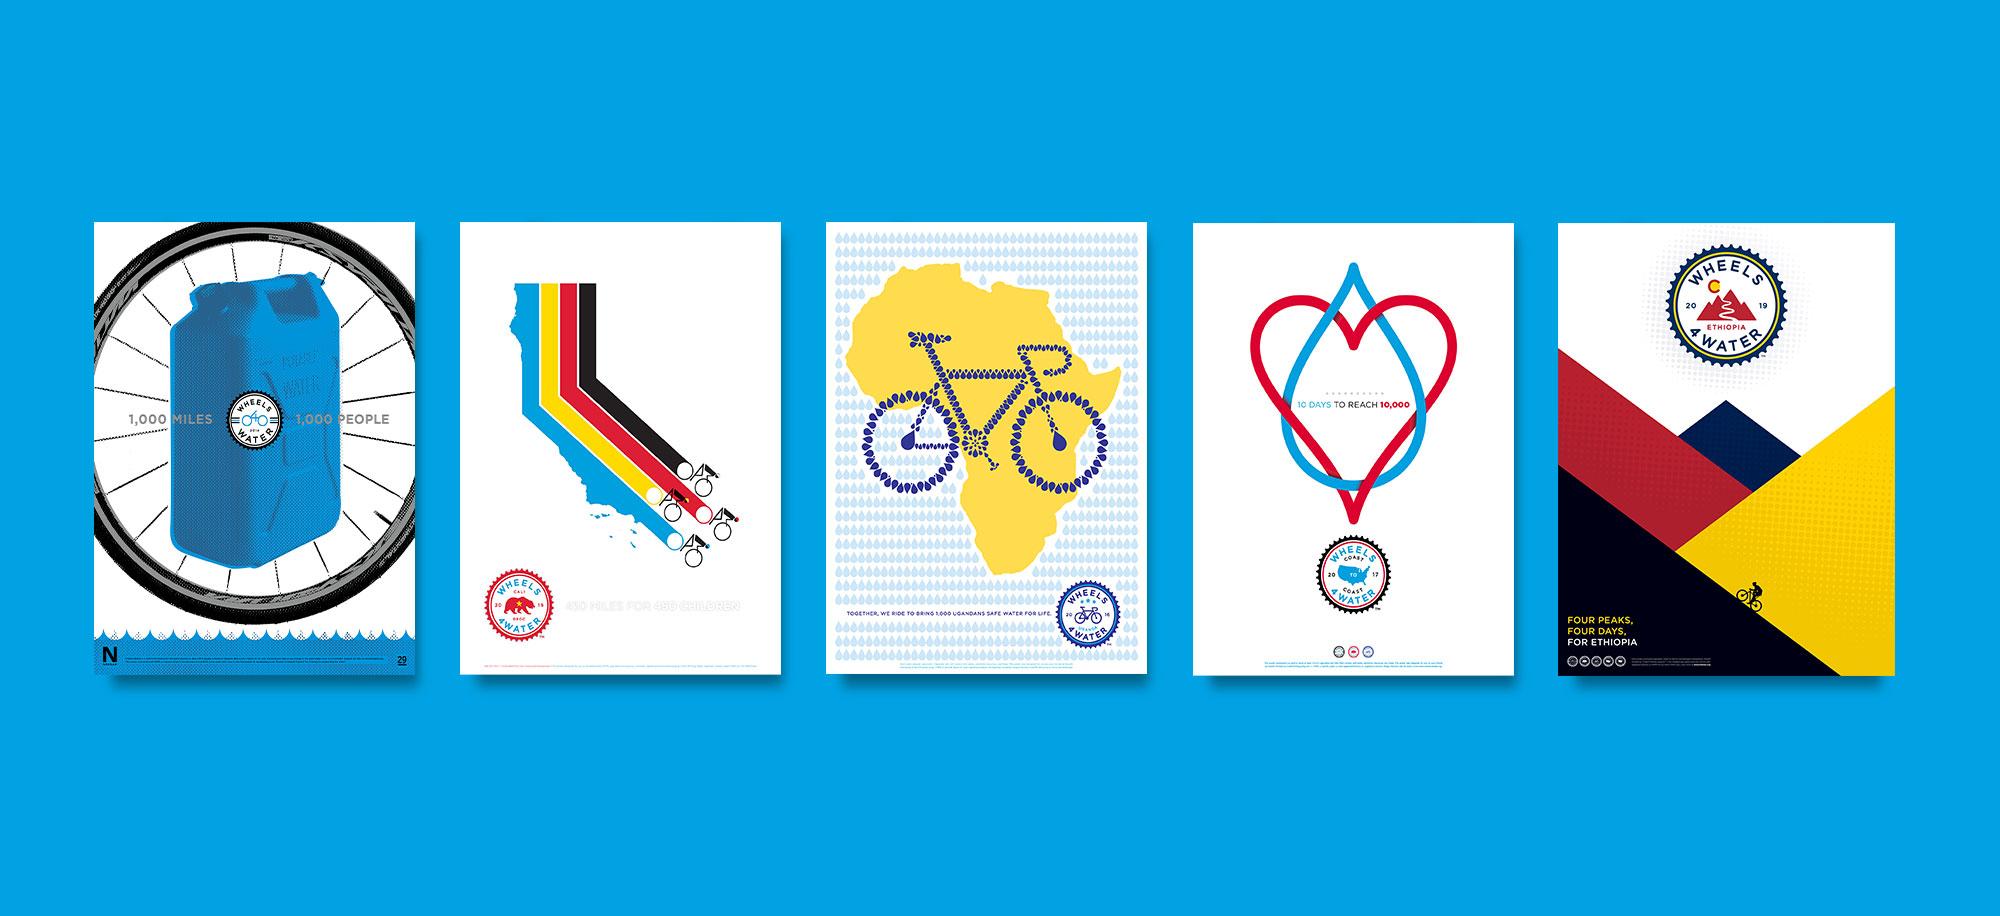 W4W Poster Designs